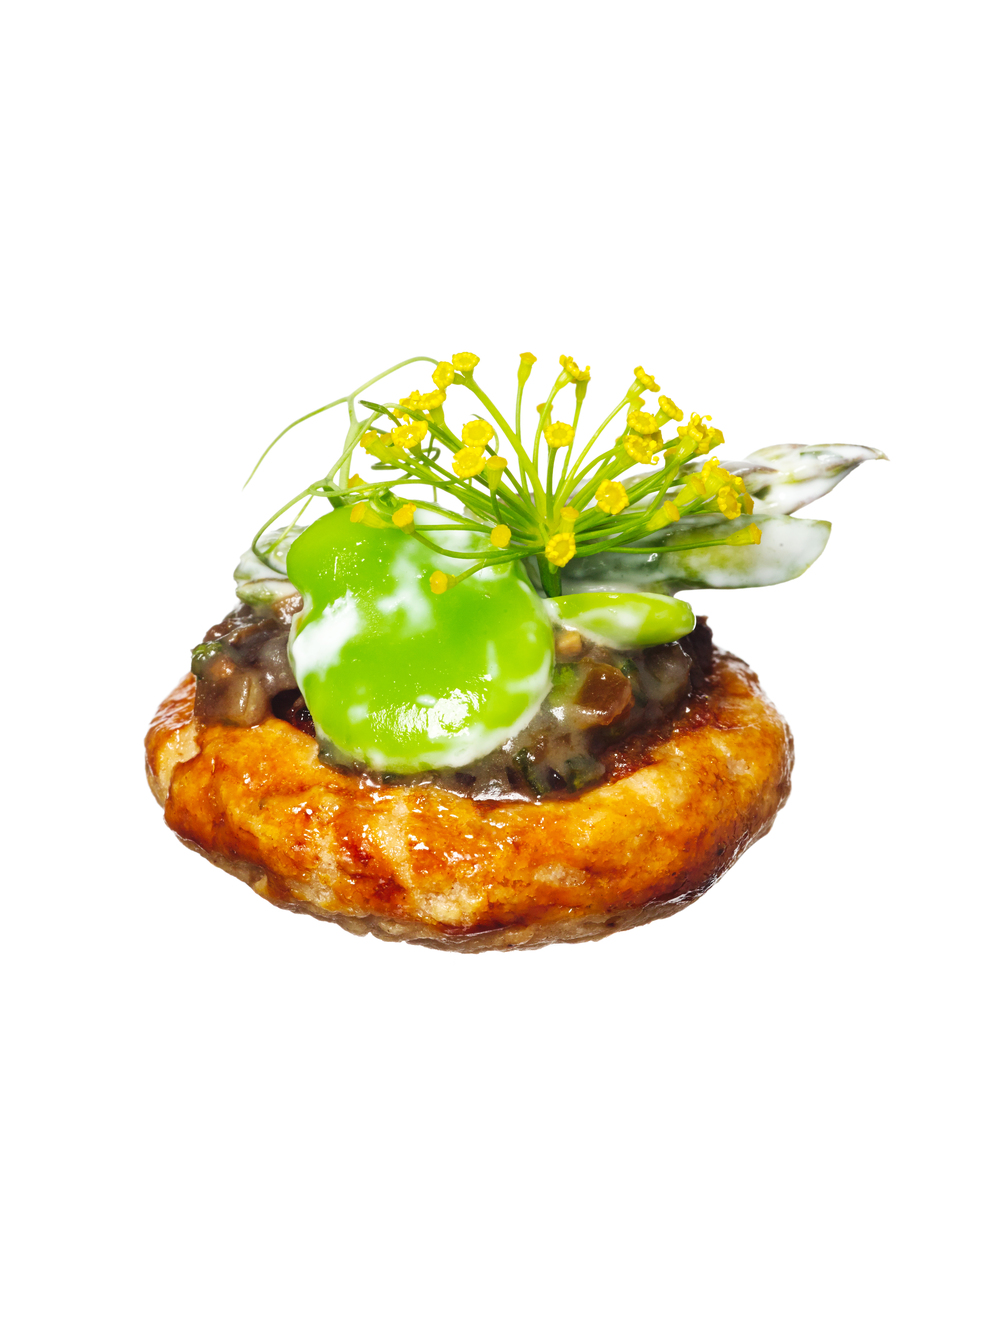 greenmarket galette canapés